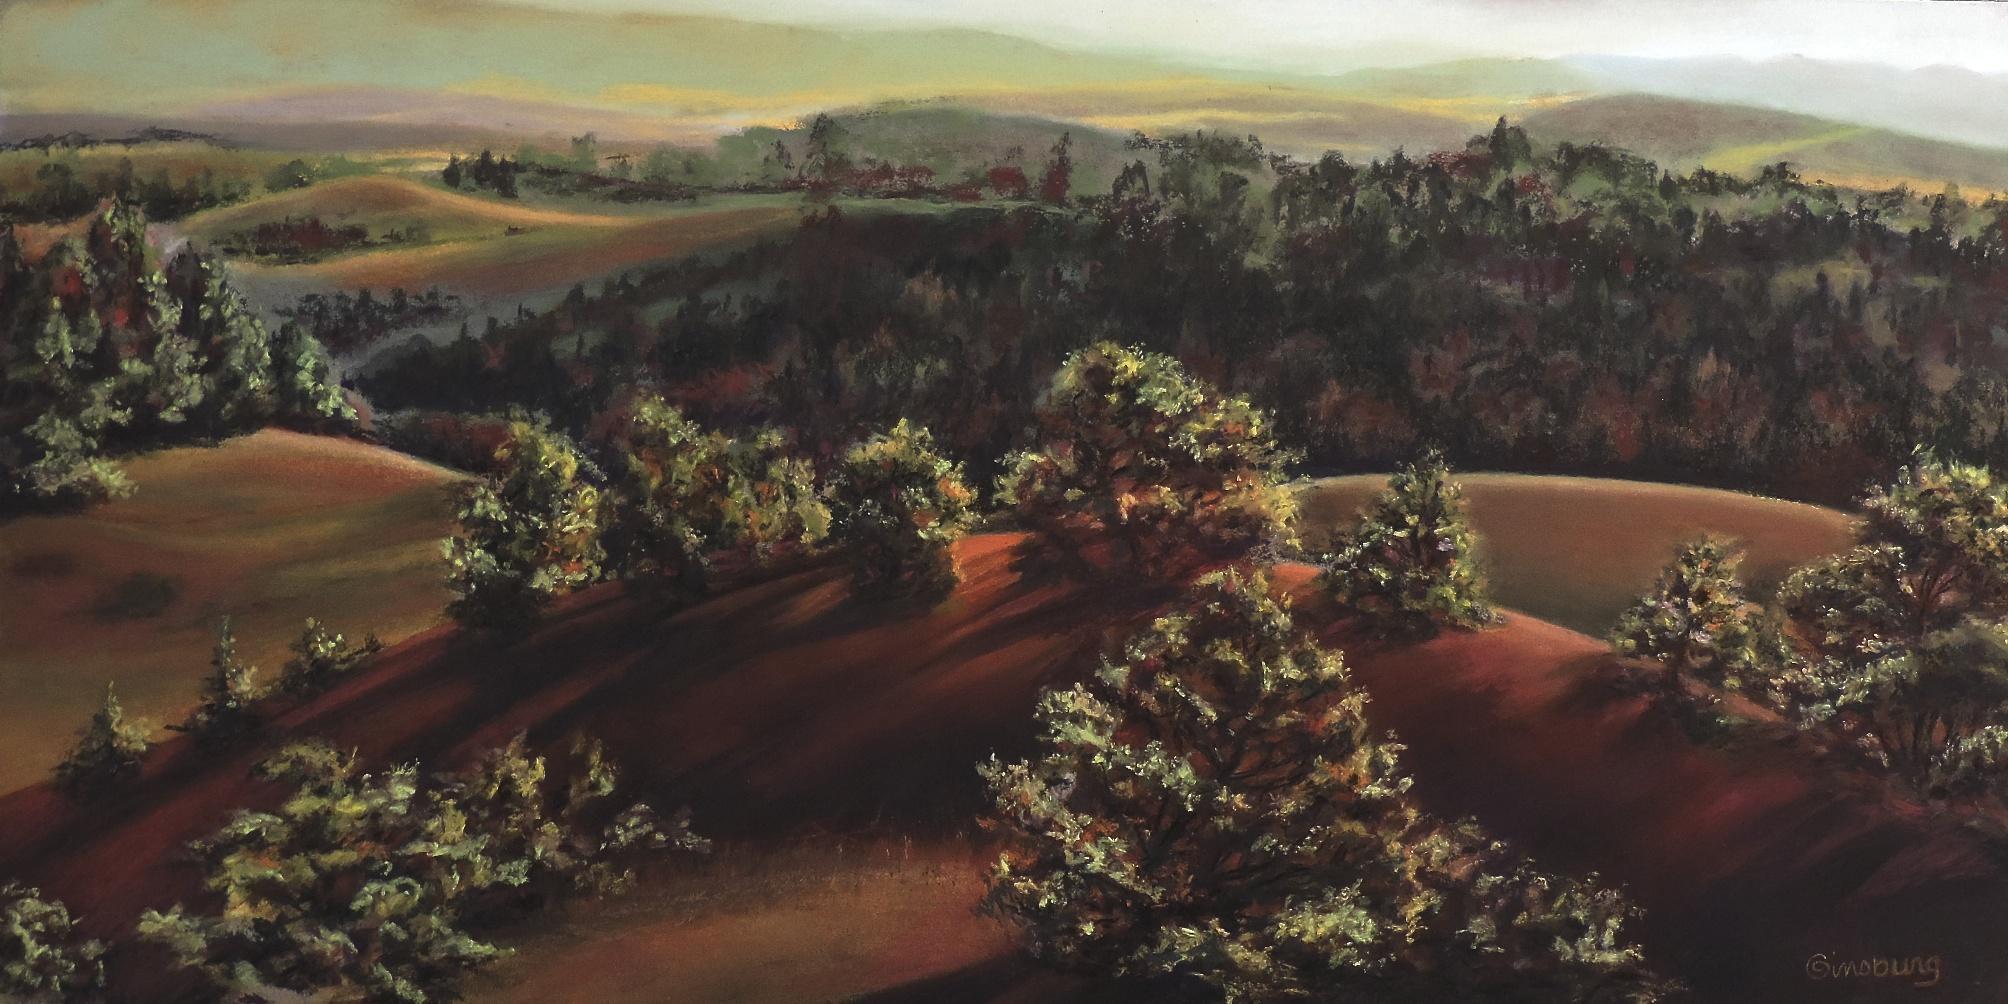 """SANDHILLS SYMPHONY"", HALSEY NATIONAL FOREST, HALSEY, NEBRASKA  Pastel  Cheri GInsburg ©"